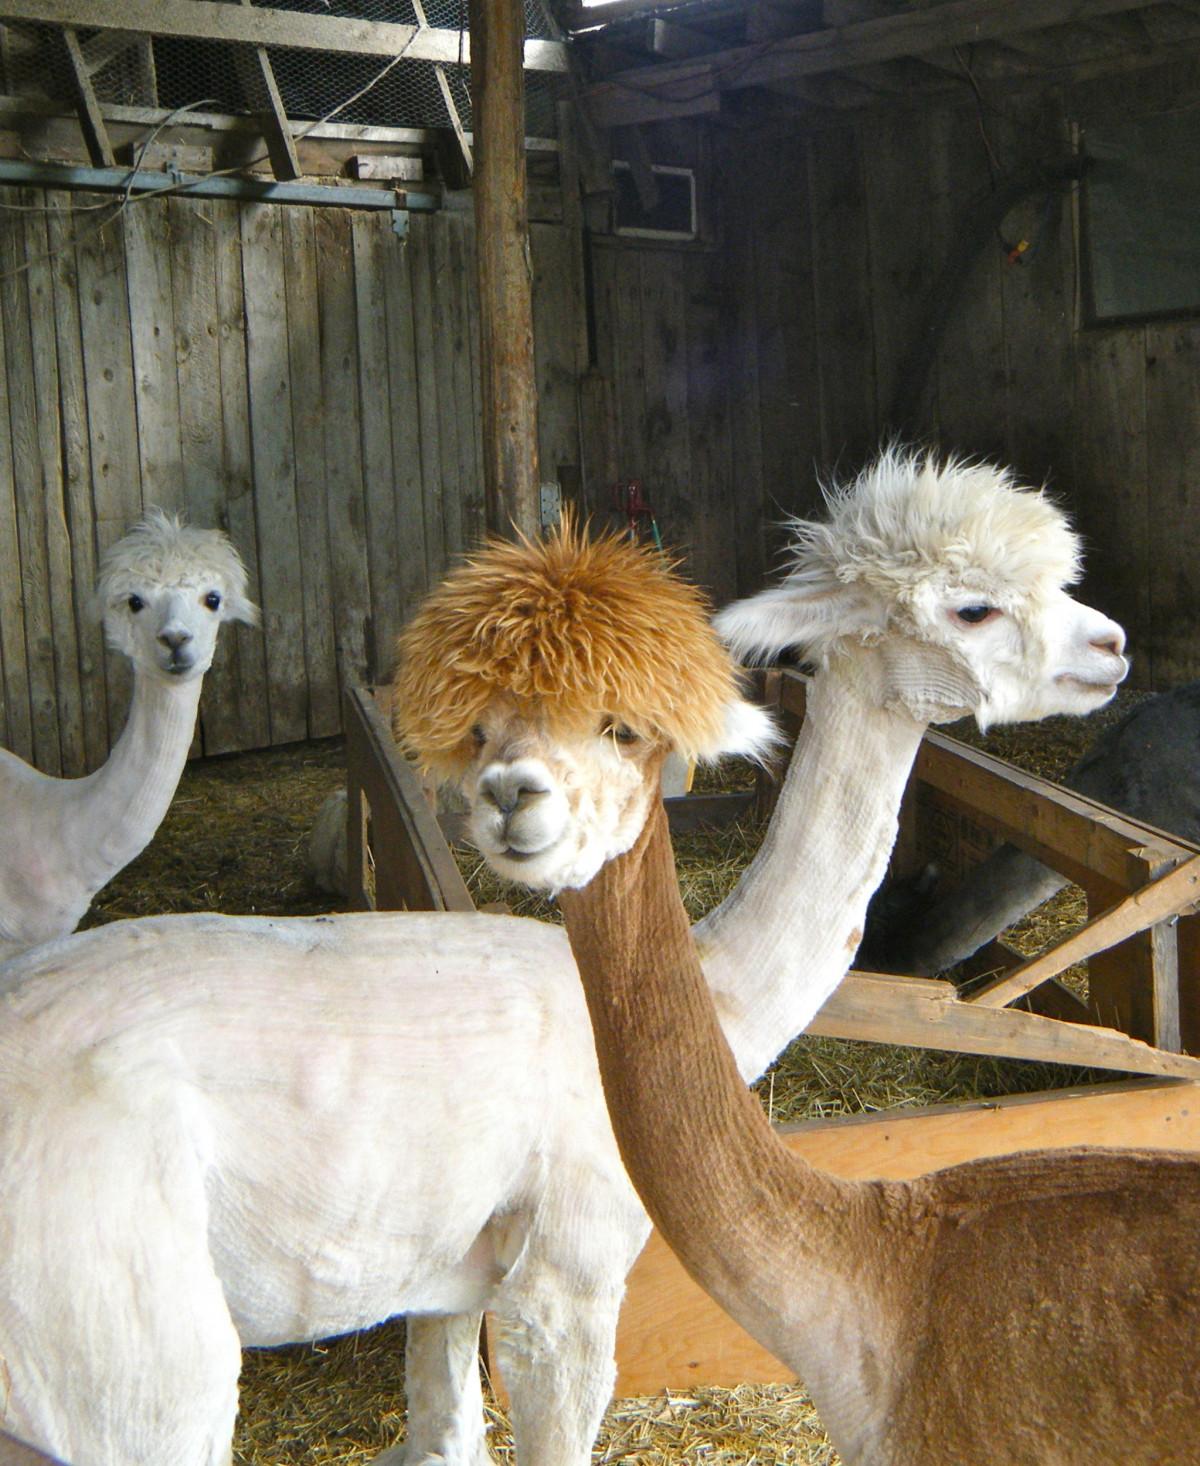 Free Images : nature, hair, farm, animal, cute, wildlife ... Llamas The Animal